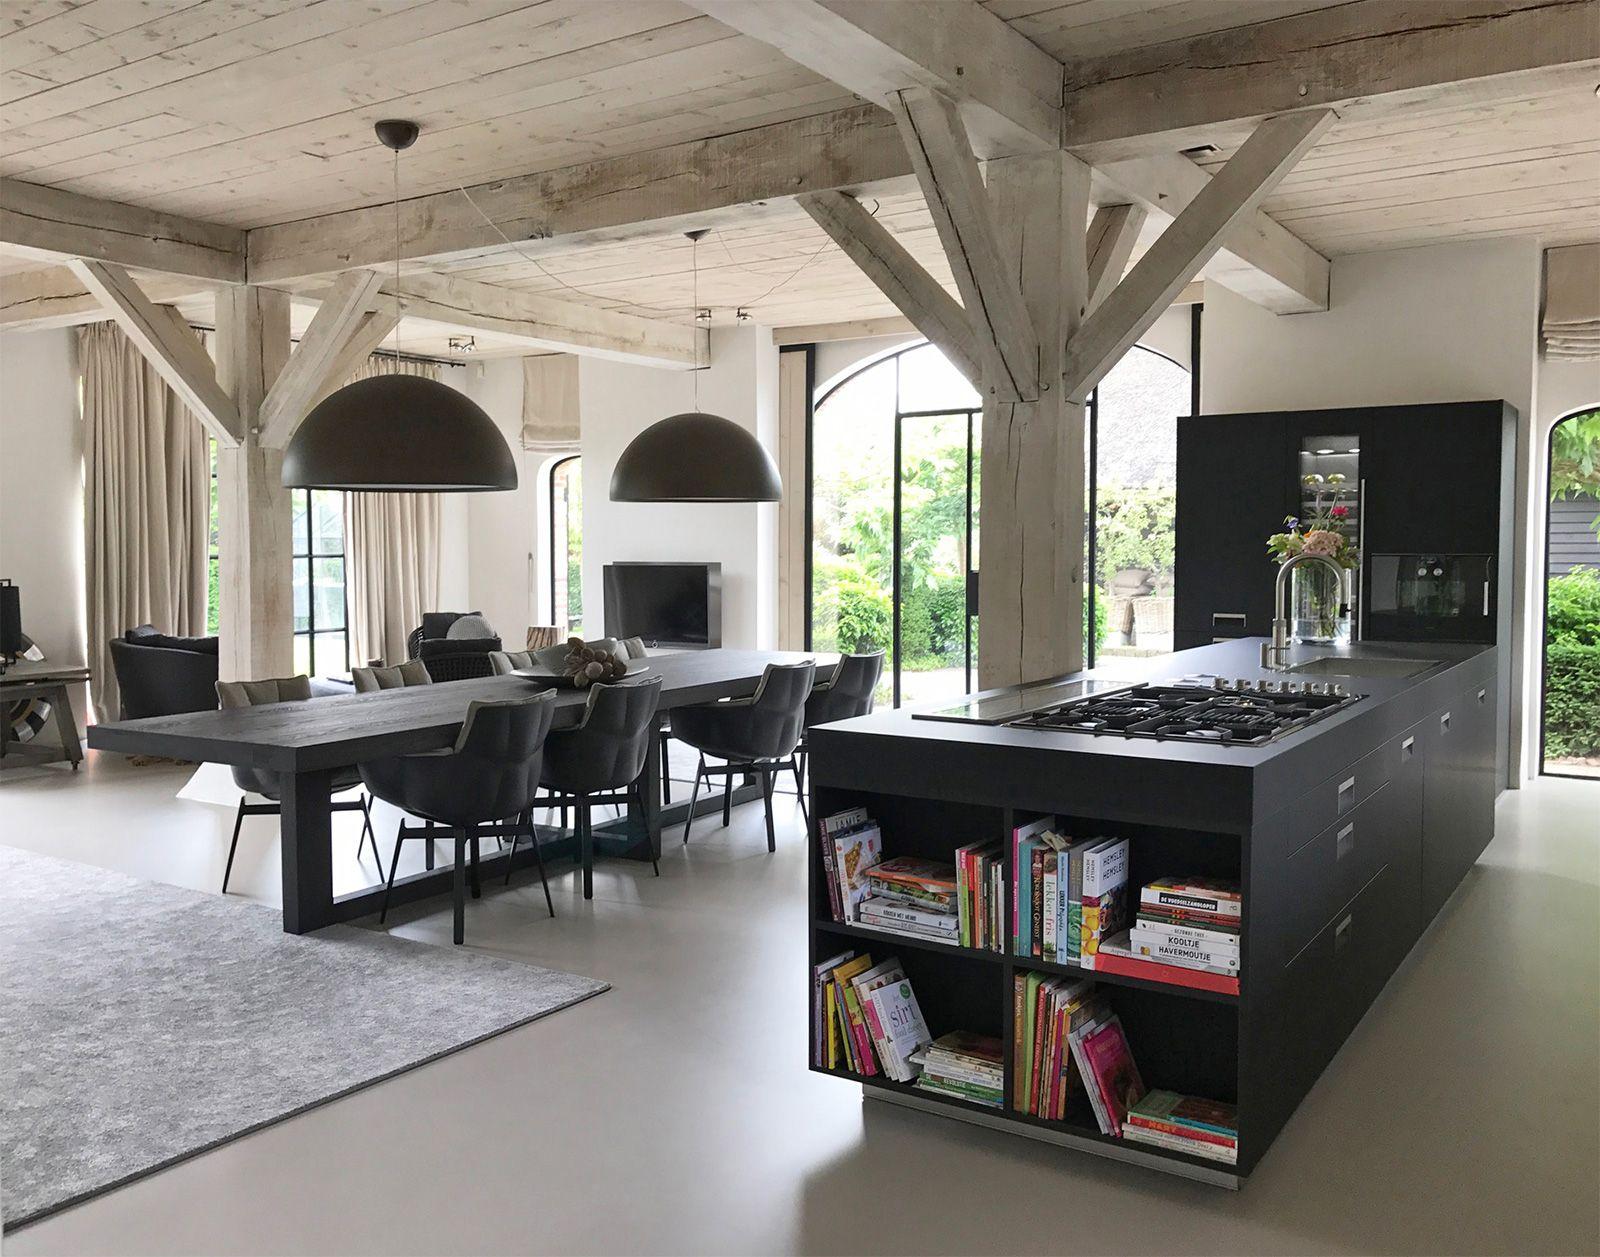 Gietvloer woonkeuken woonboerderij modern interiors modern and